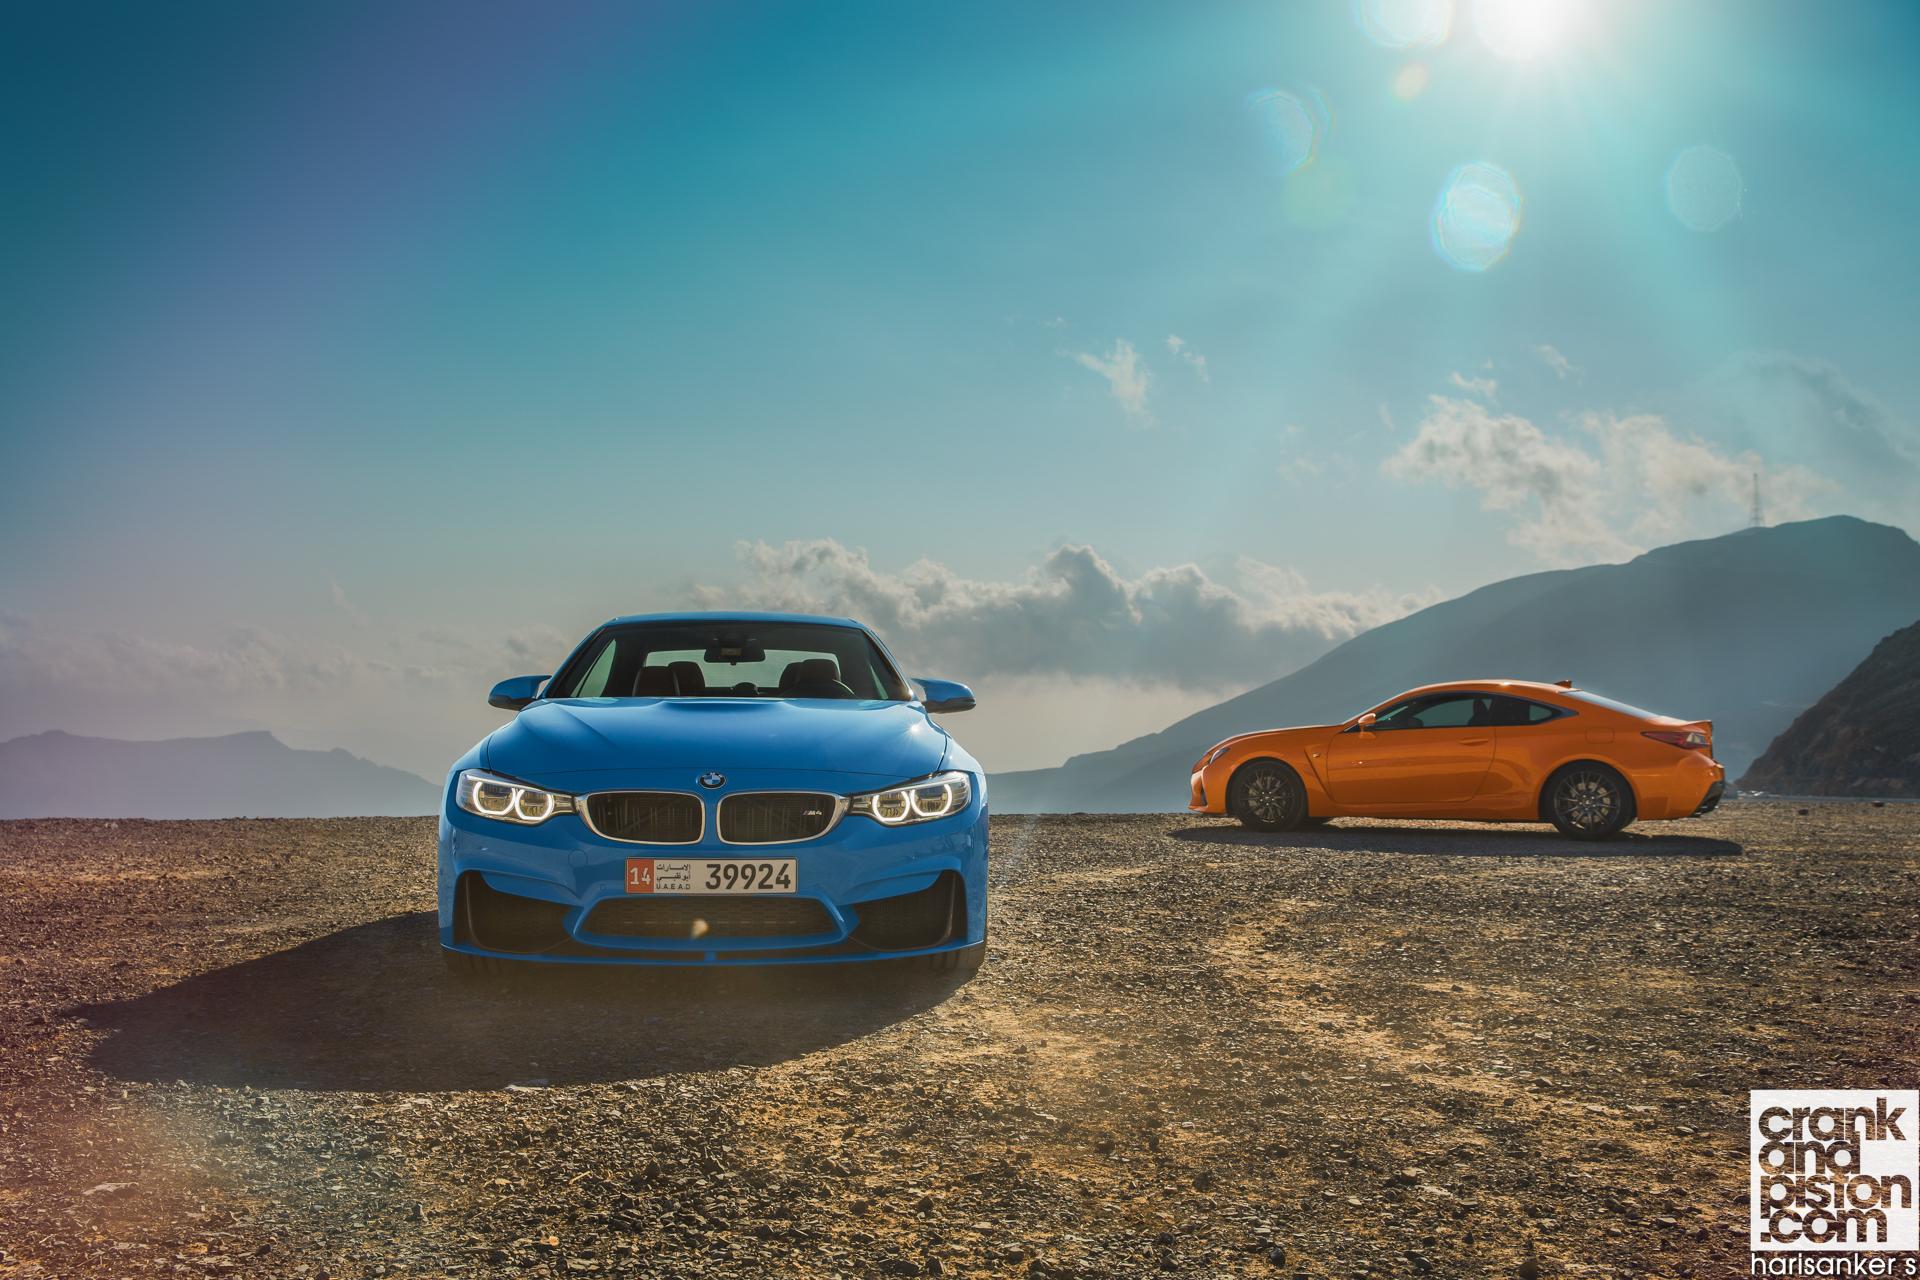 BMW M4 Convertible vs Lexus RC F crankandpiston Wallpapers-02